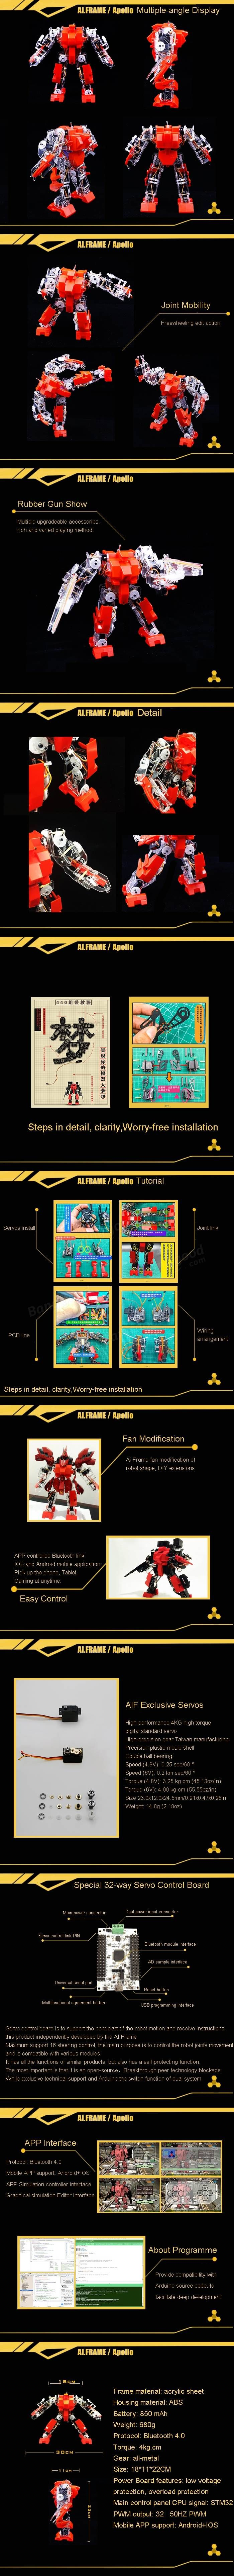 AI.Frame Apollo AIF-44-0 Humanoid DIY Robot Kit Compatible with Arduino Sale - Banggood.com